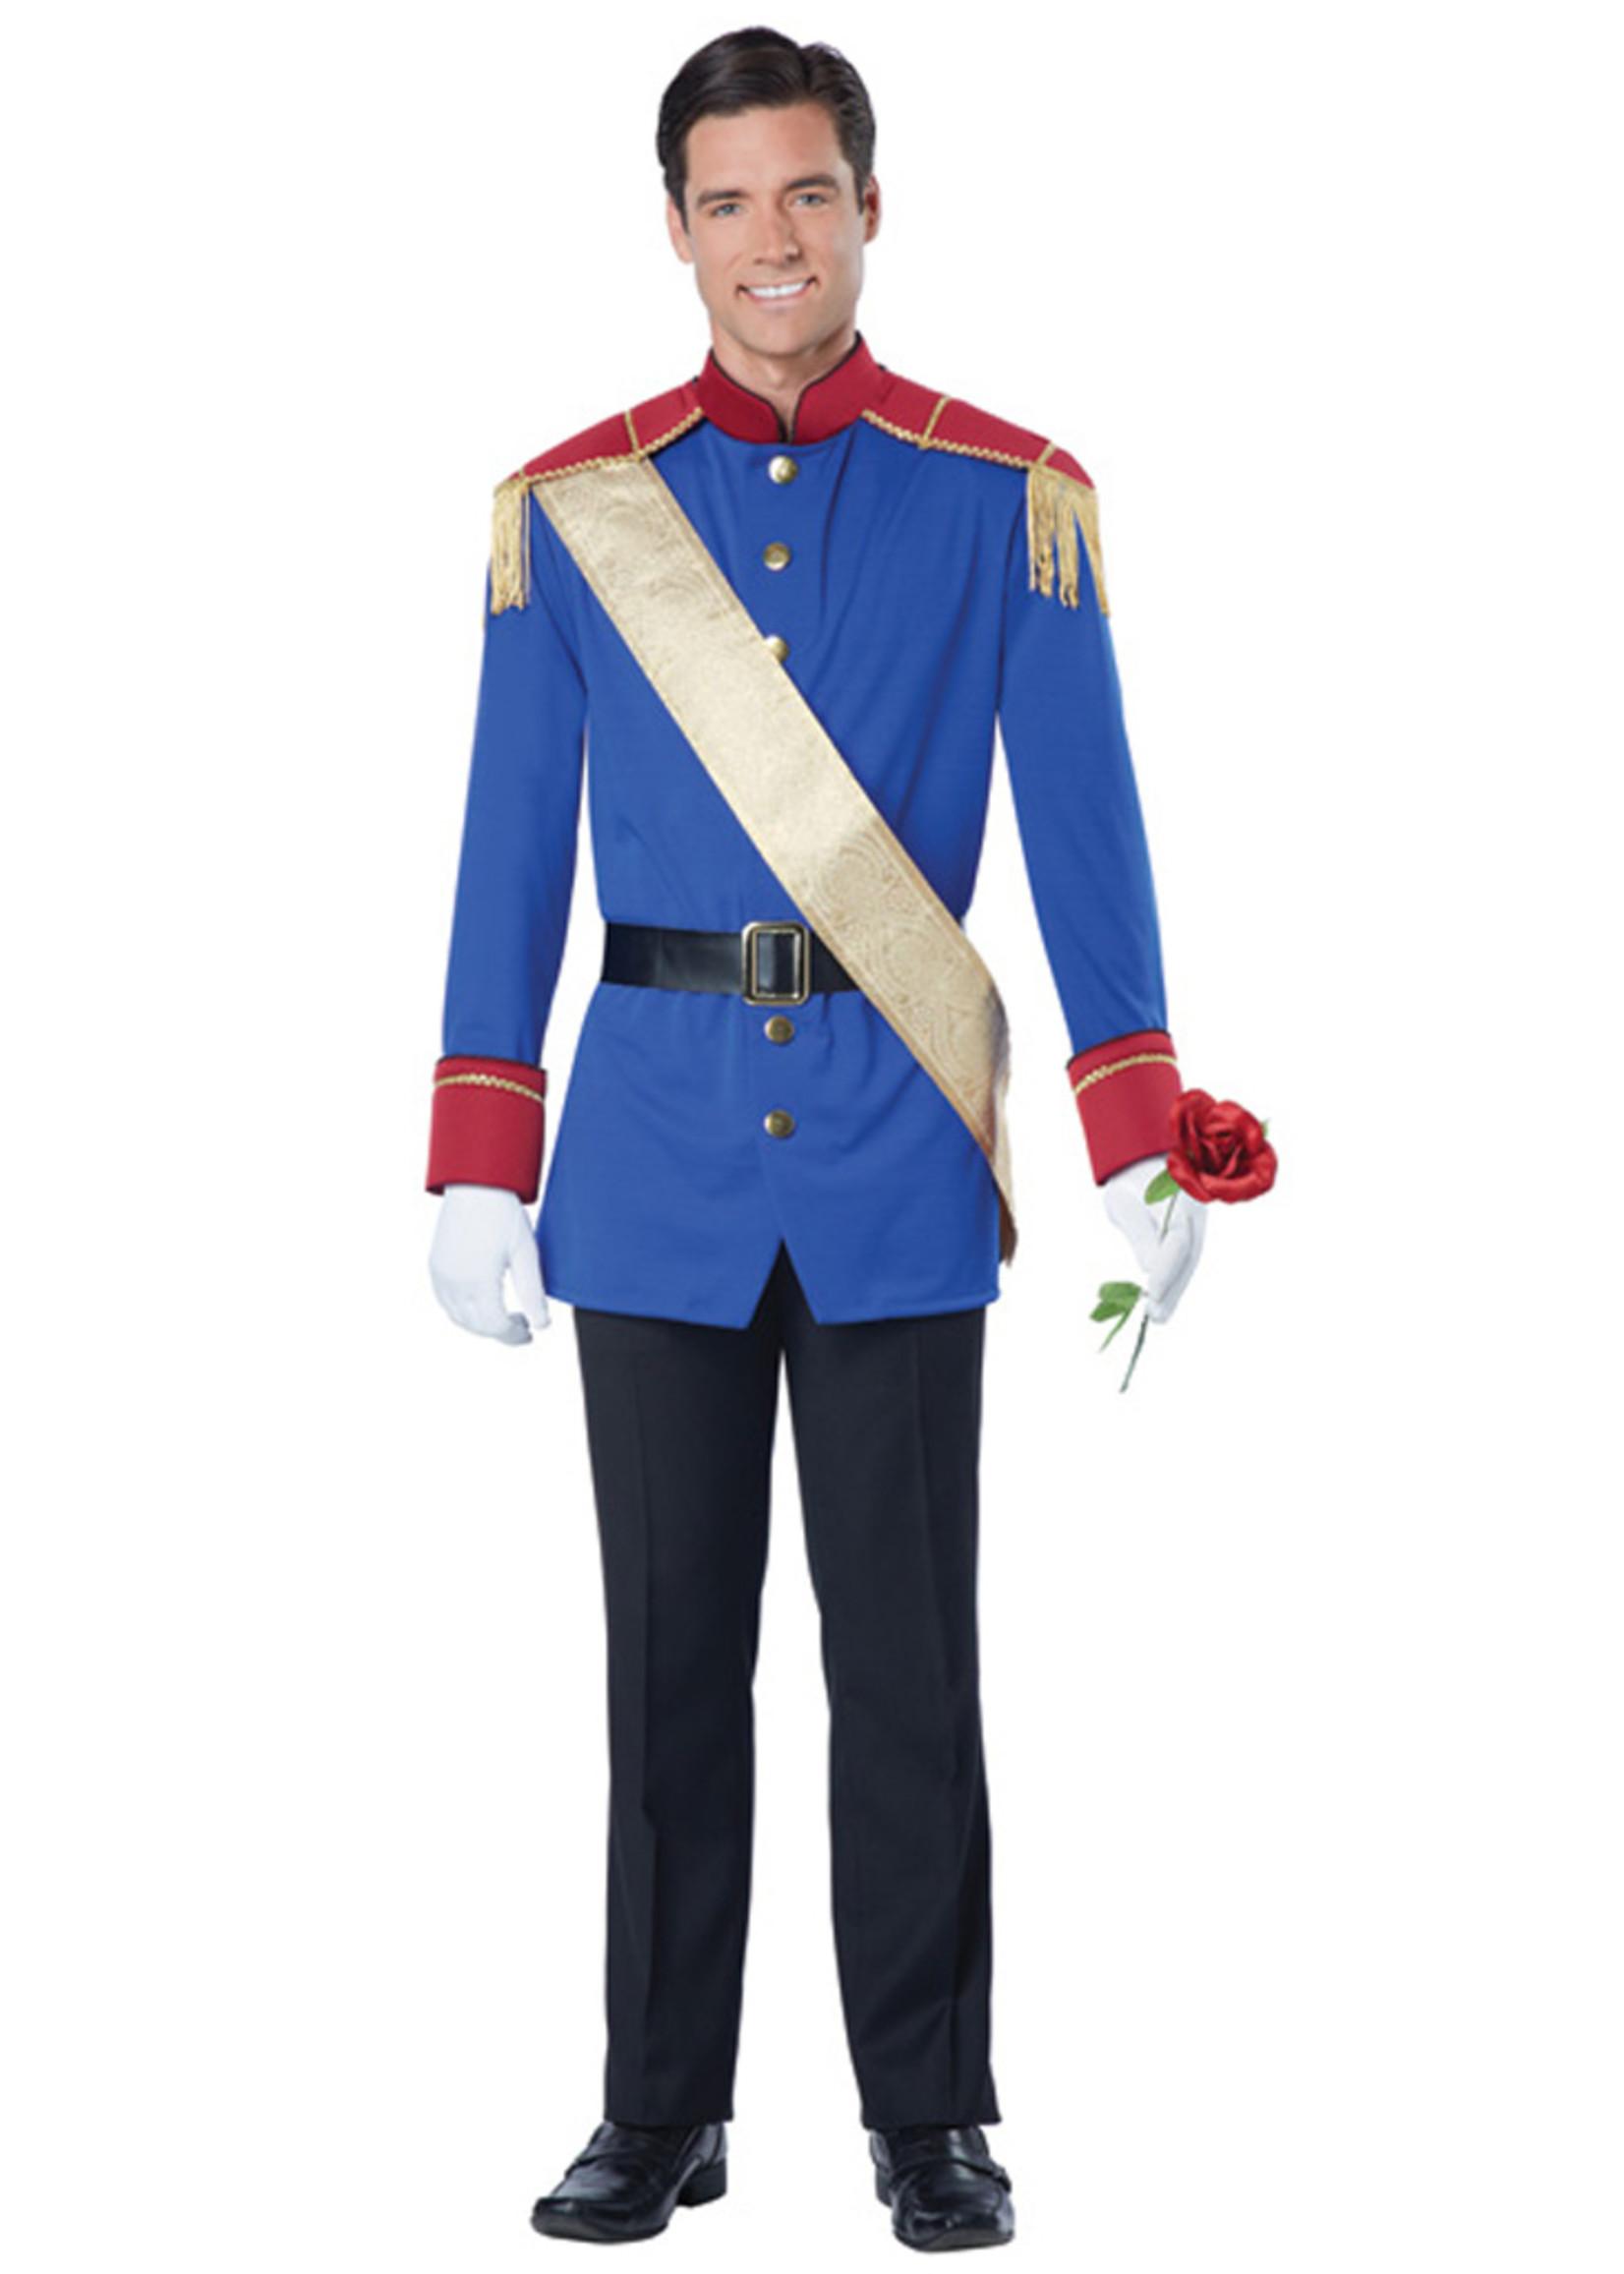 Storybook Prince Costume - Men's